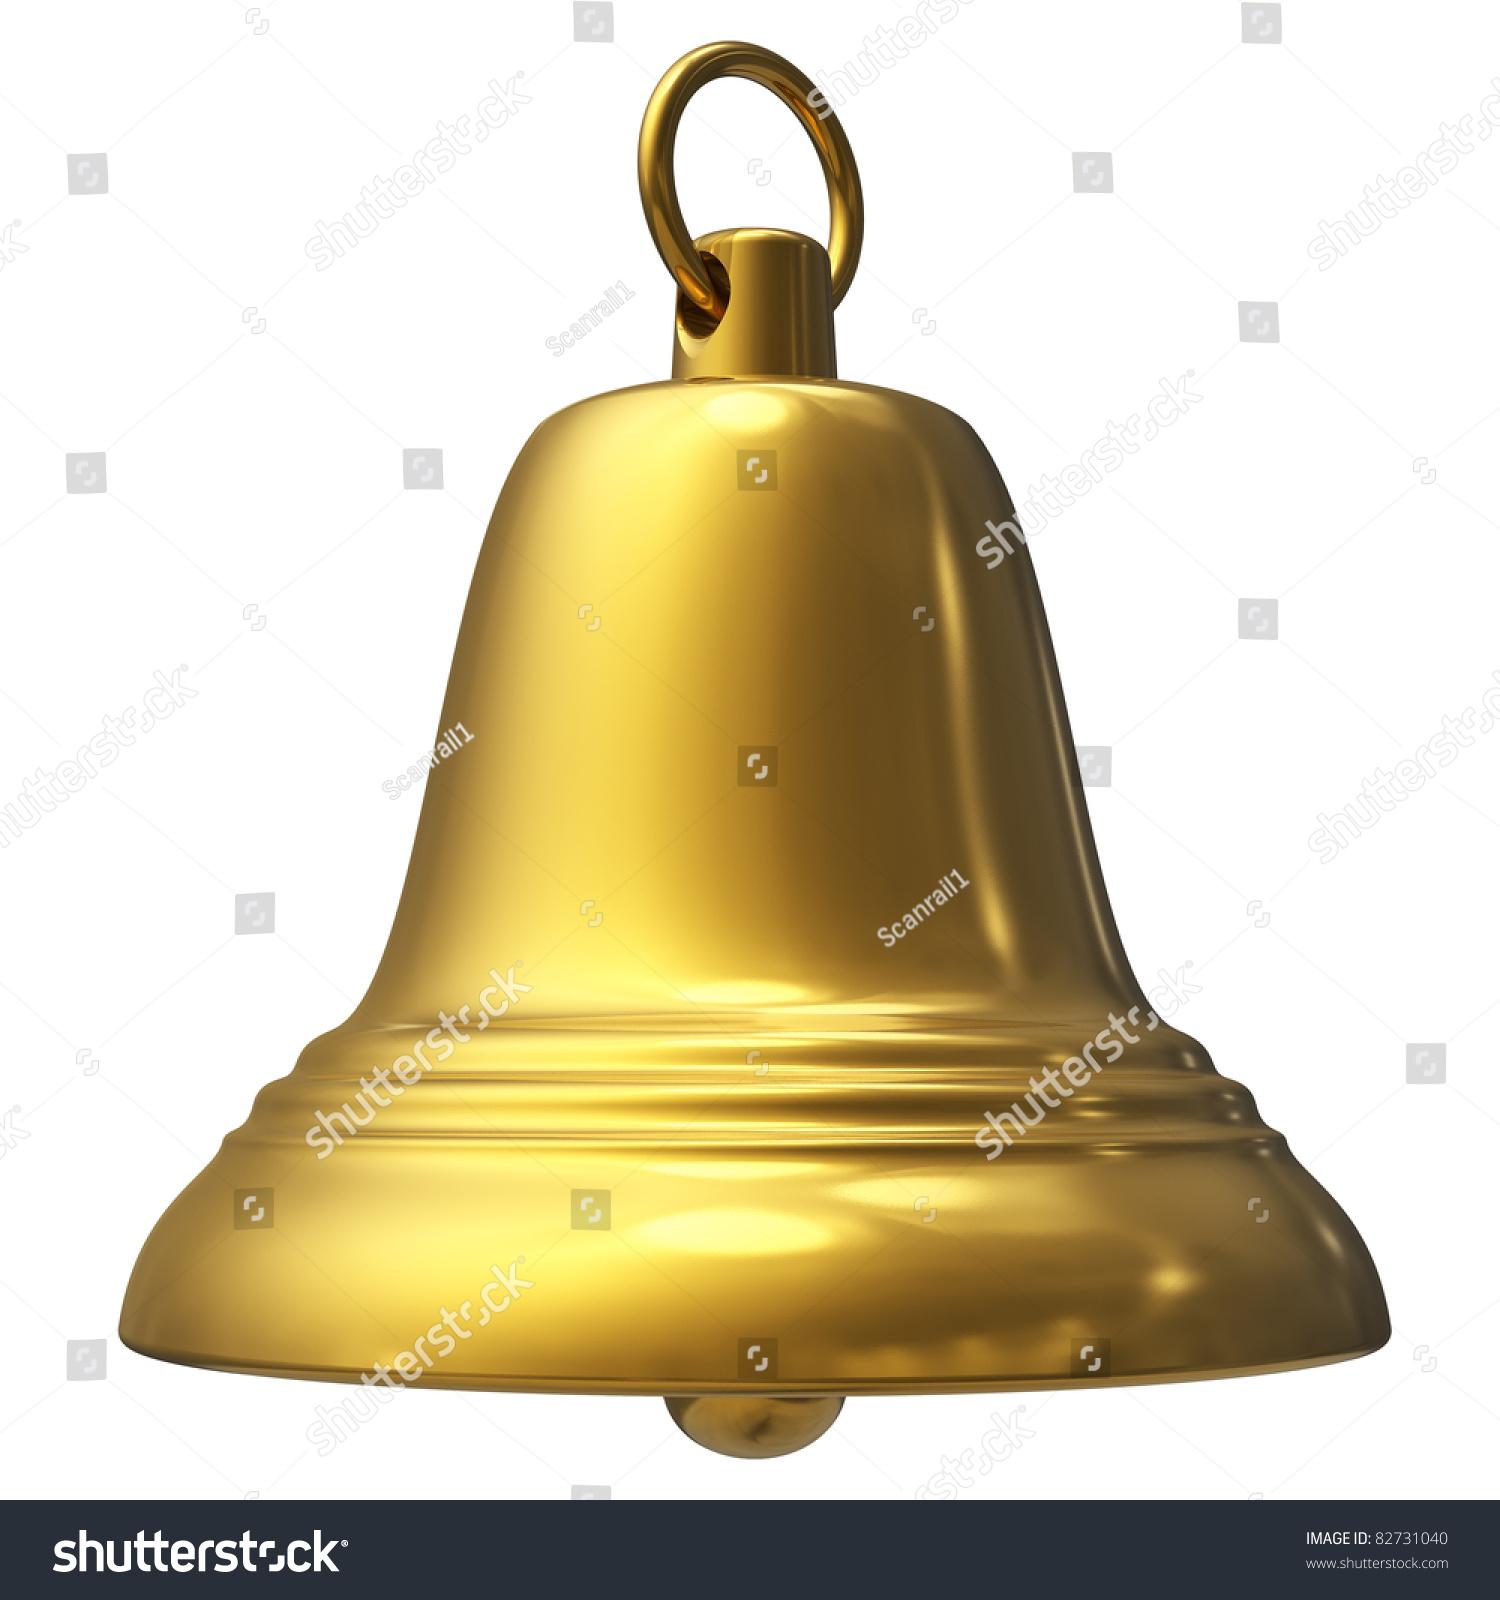 christmas golden bells images